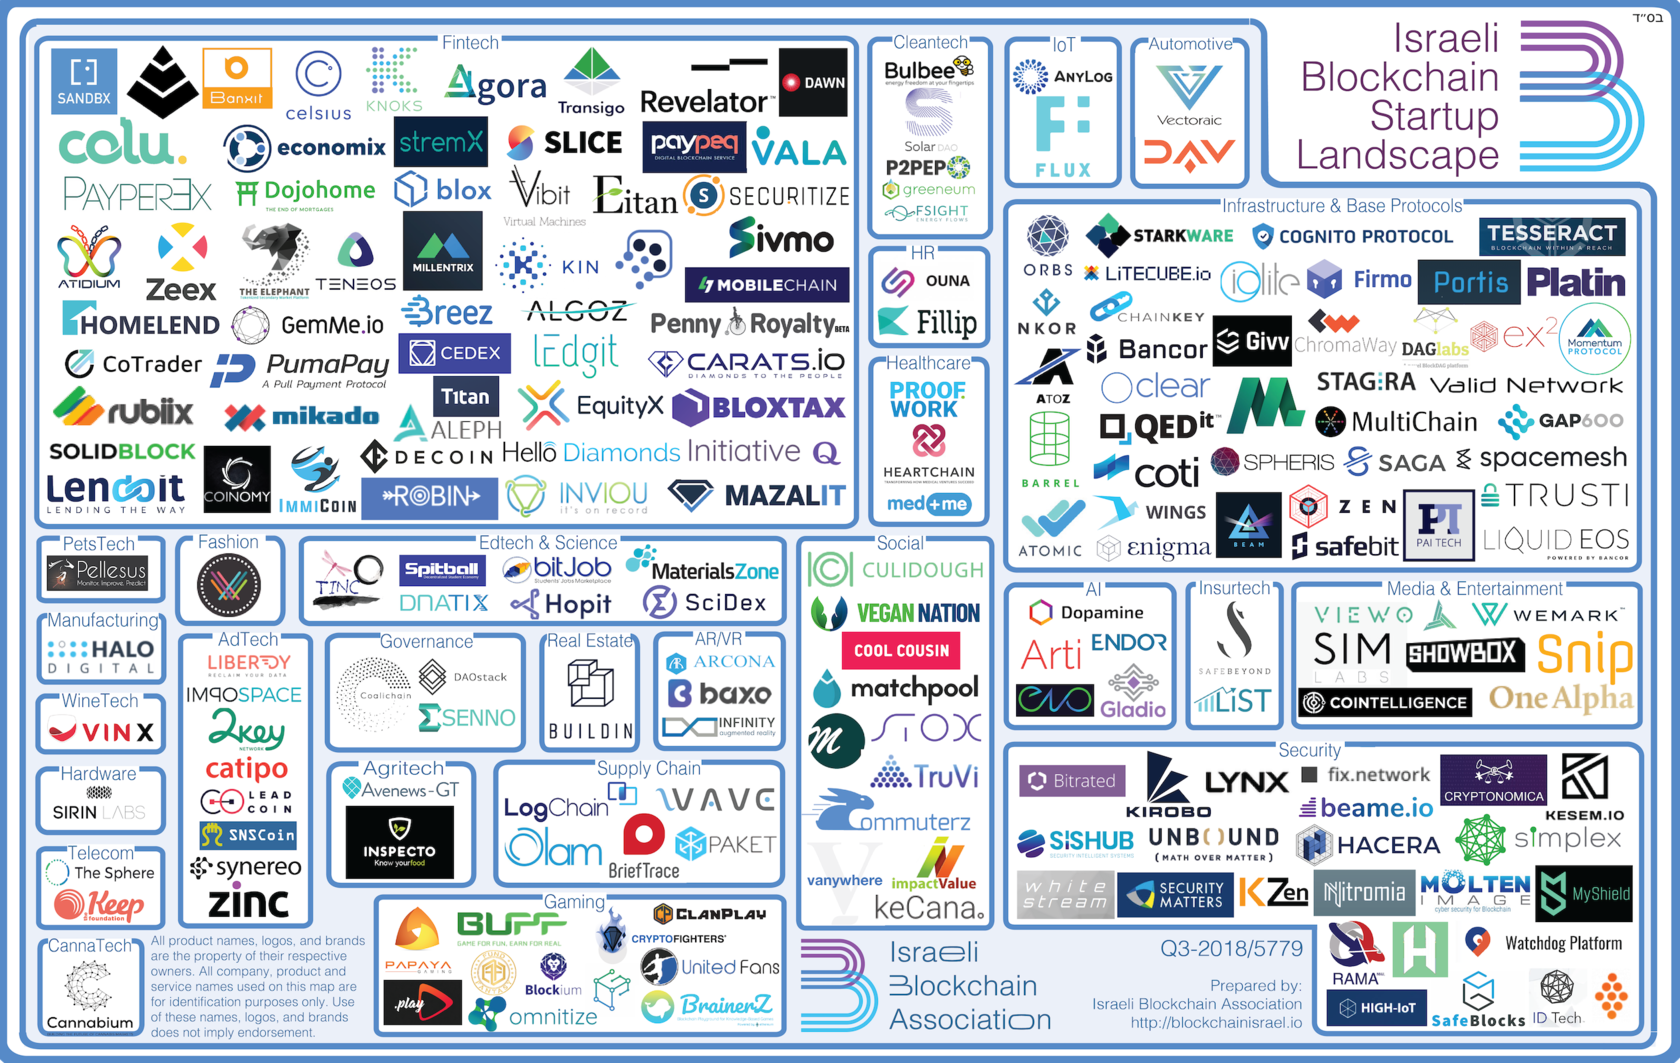 Israeli Blockchain Startup Landscape